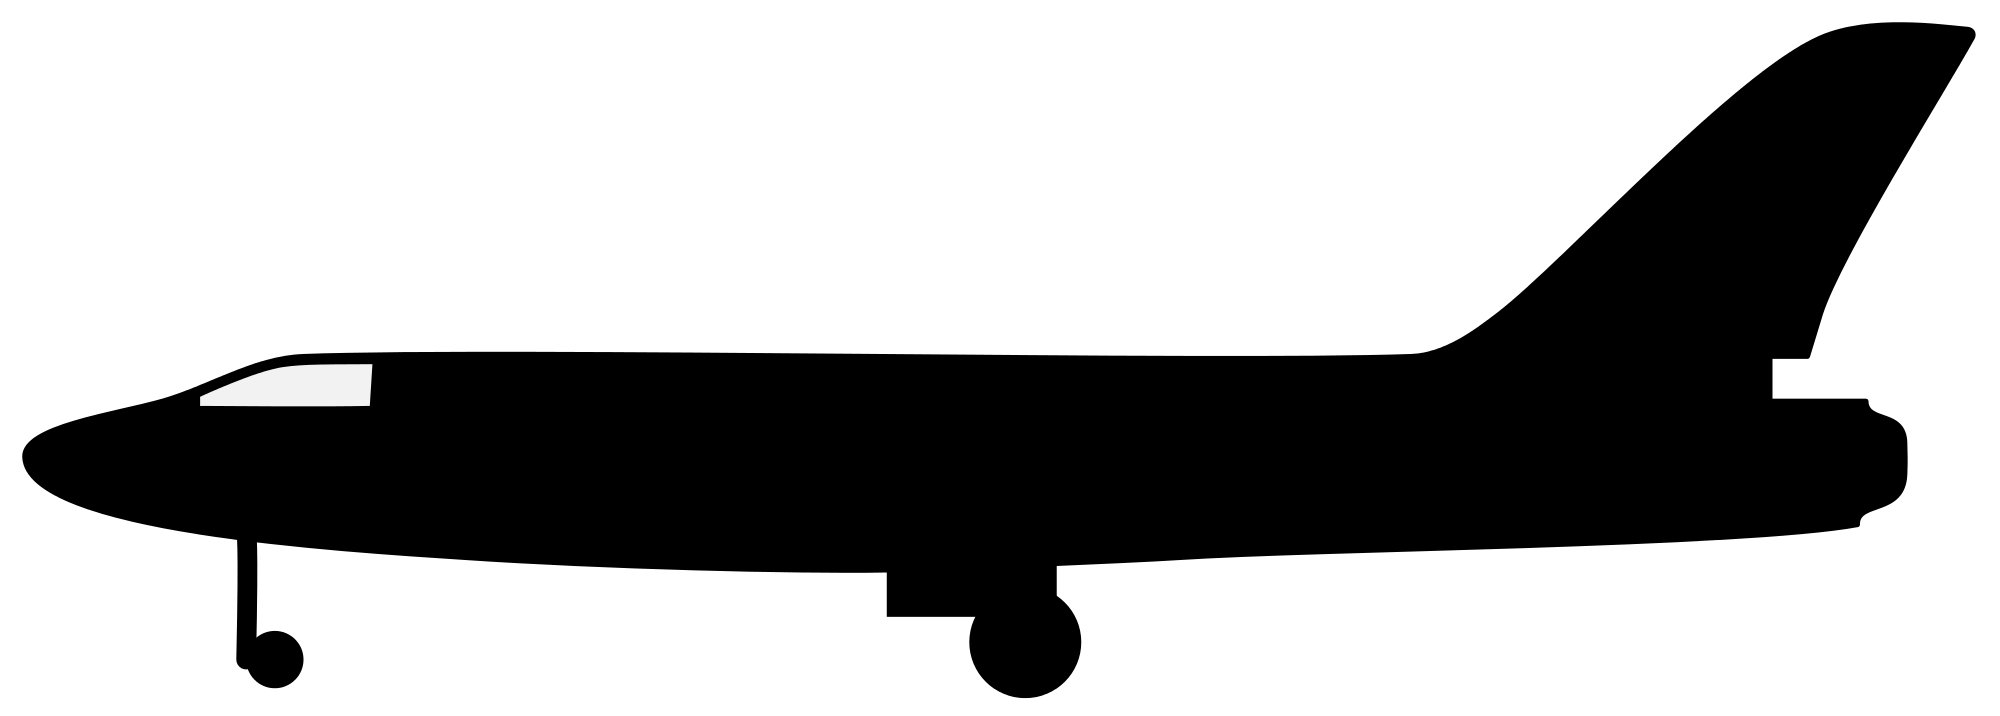 2000x716 Filesilhouette Plane.svg